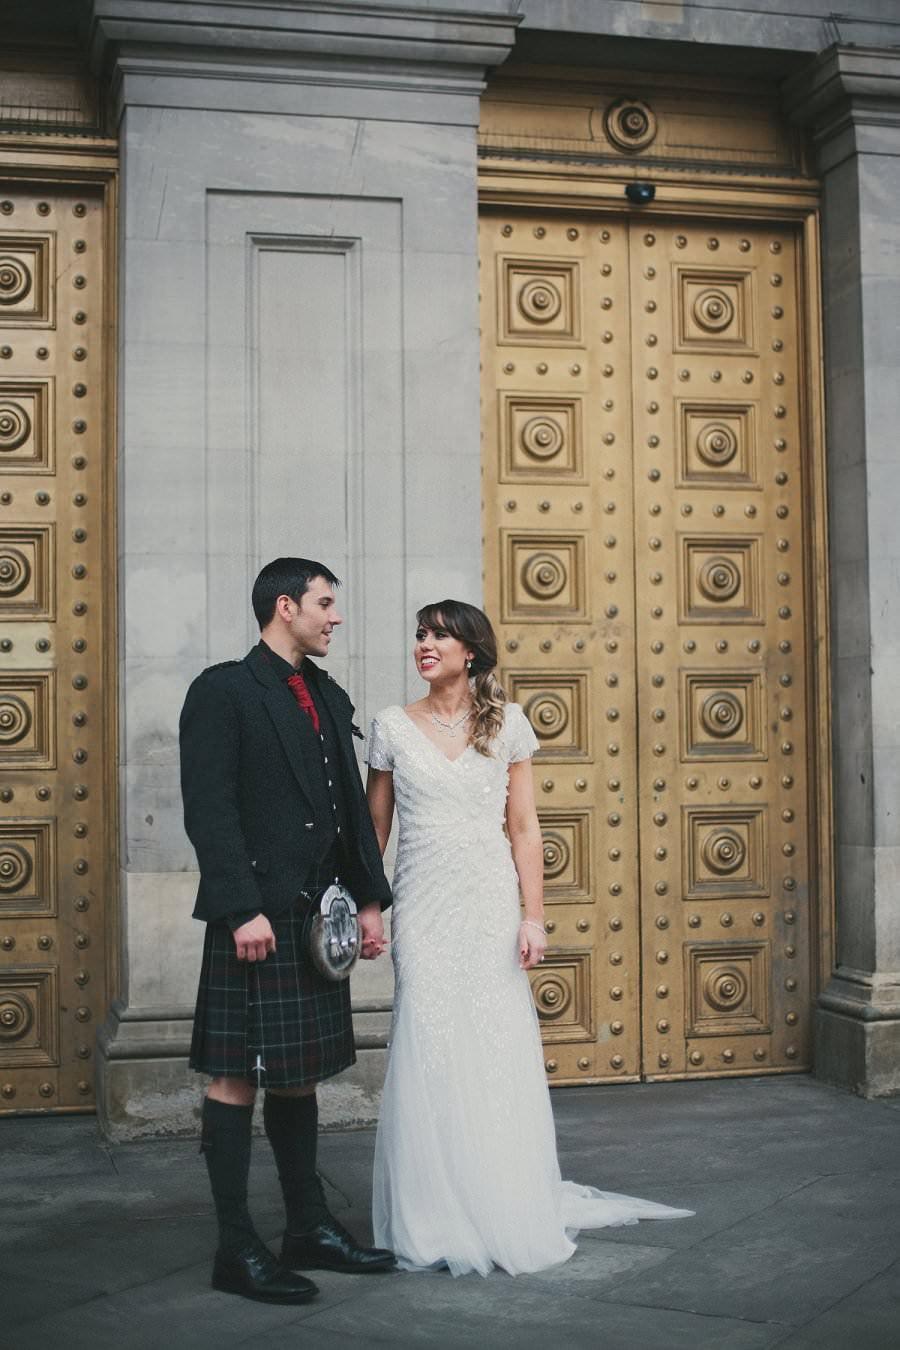 29-glasgow-artistic-wedding-photography-82